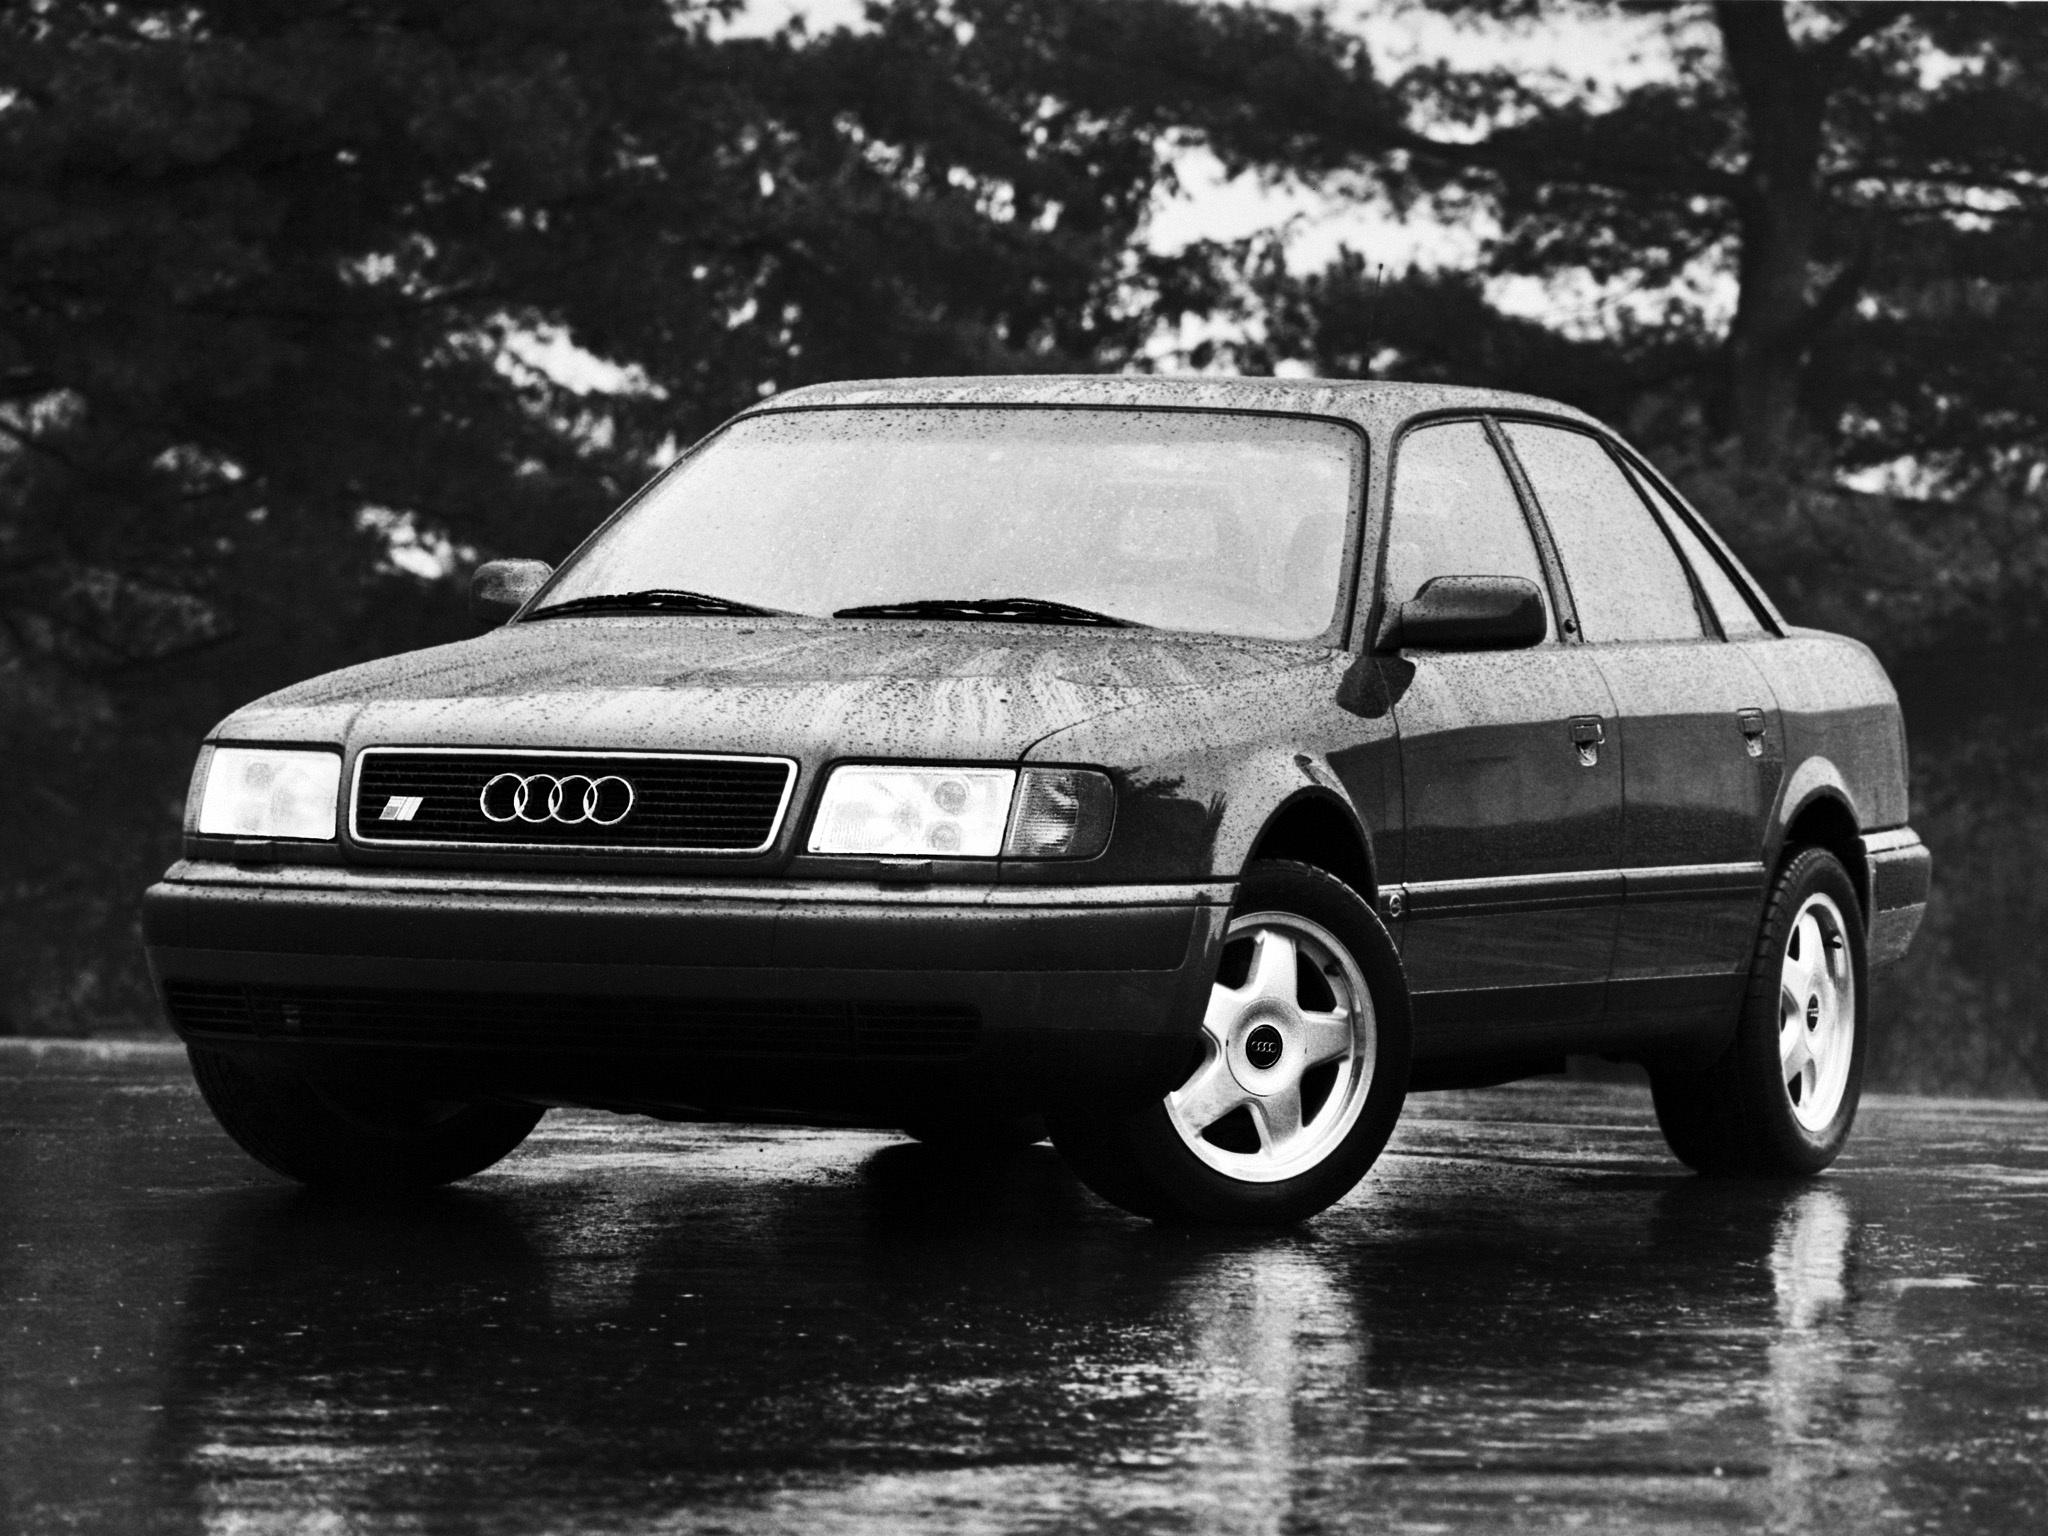 Kekurangan Audi 100 S4 Spesifikasi